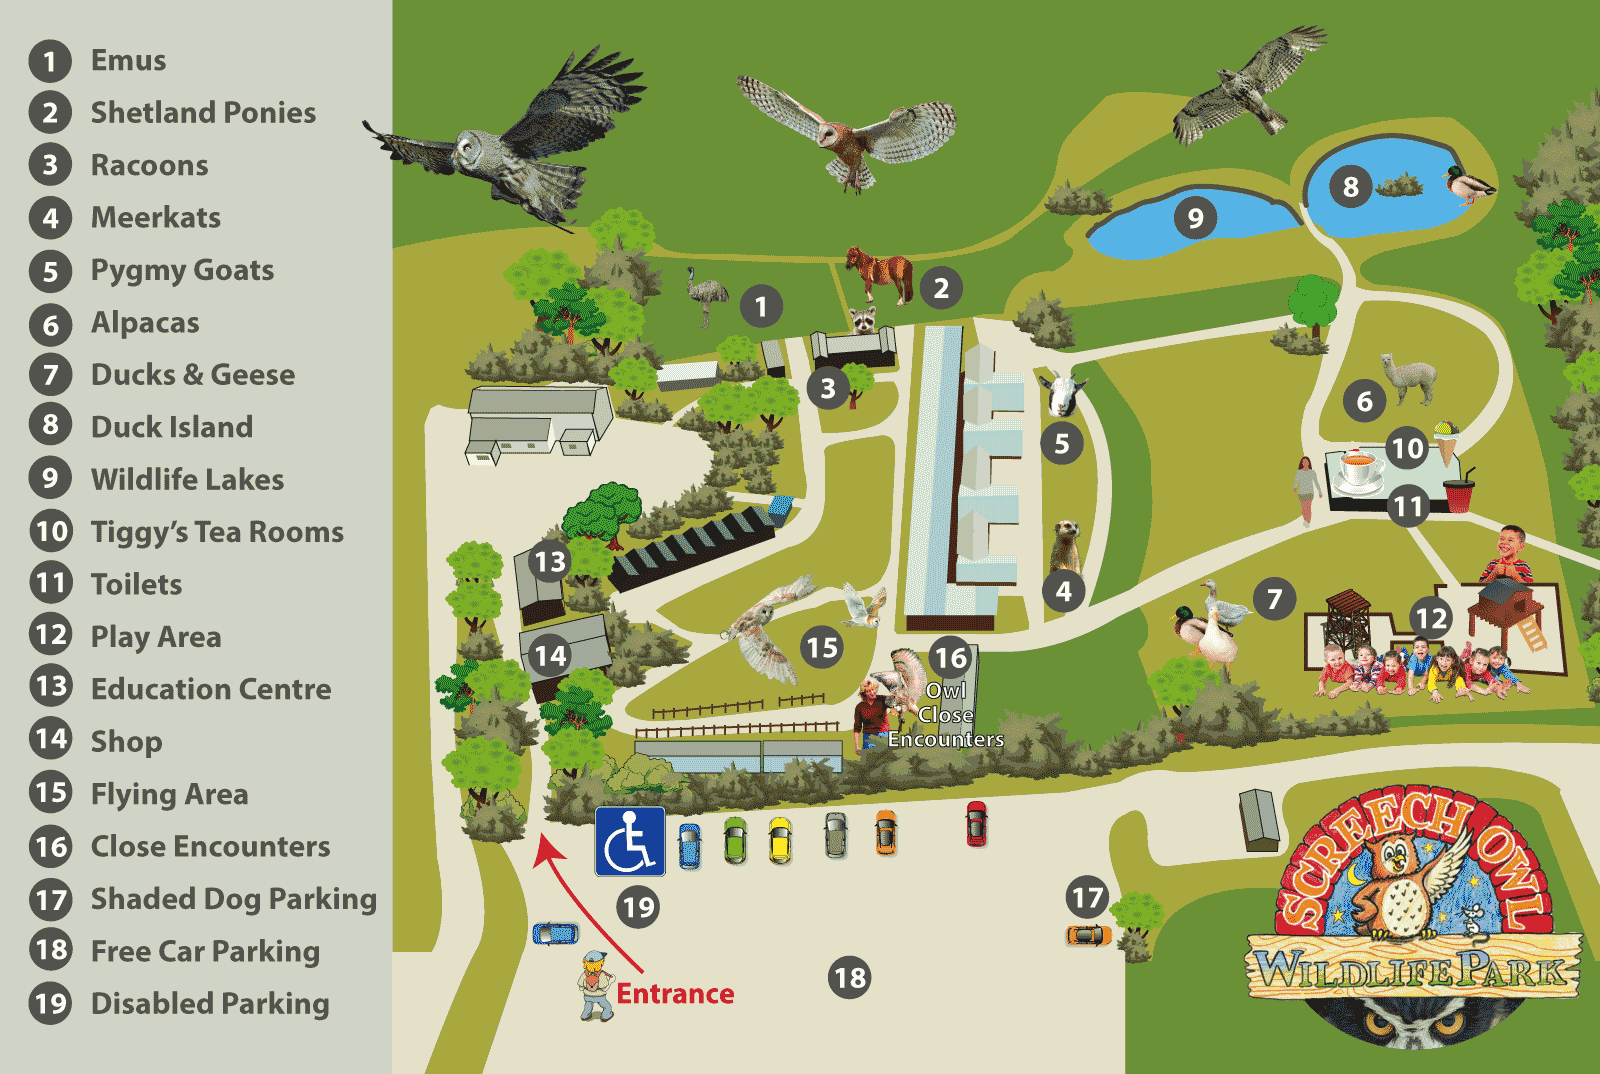 Site map for the Screech Owl Wildlife Park